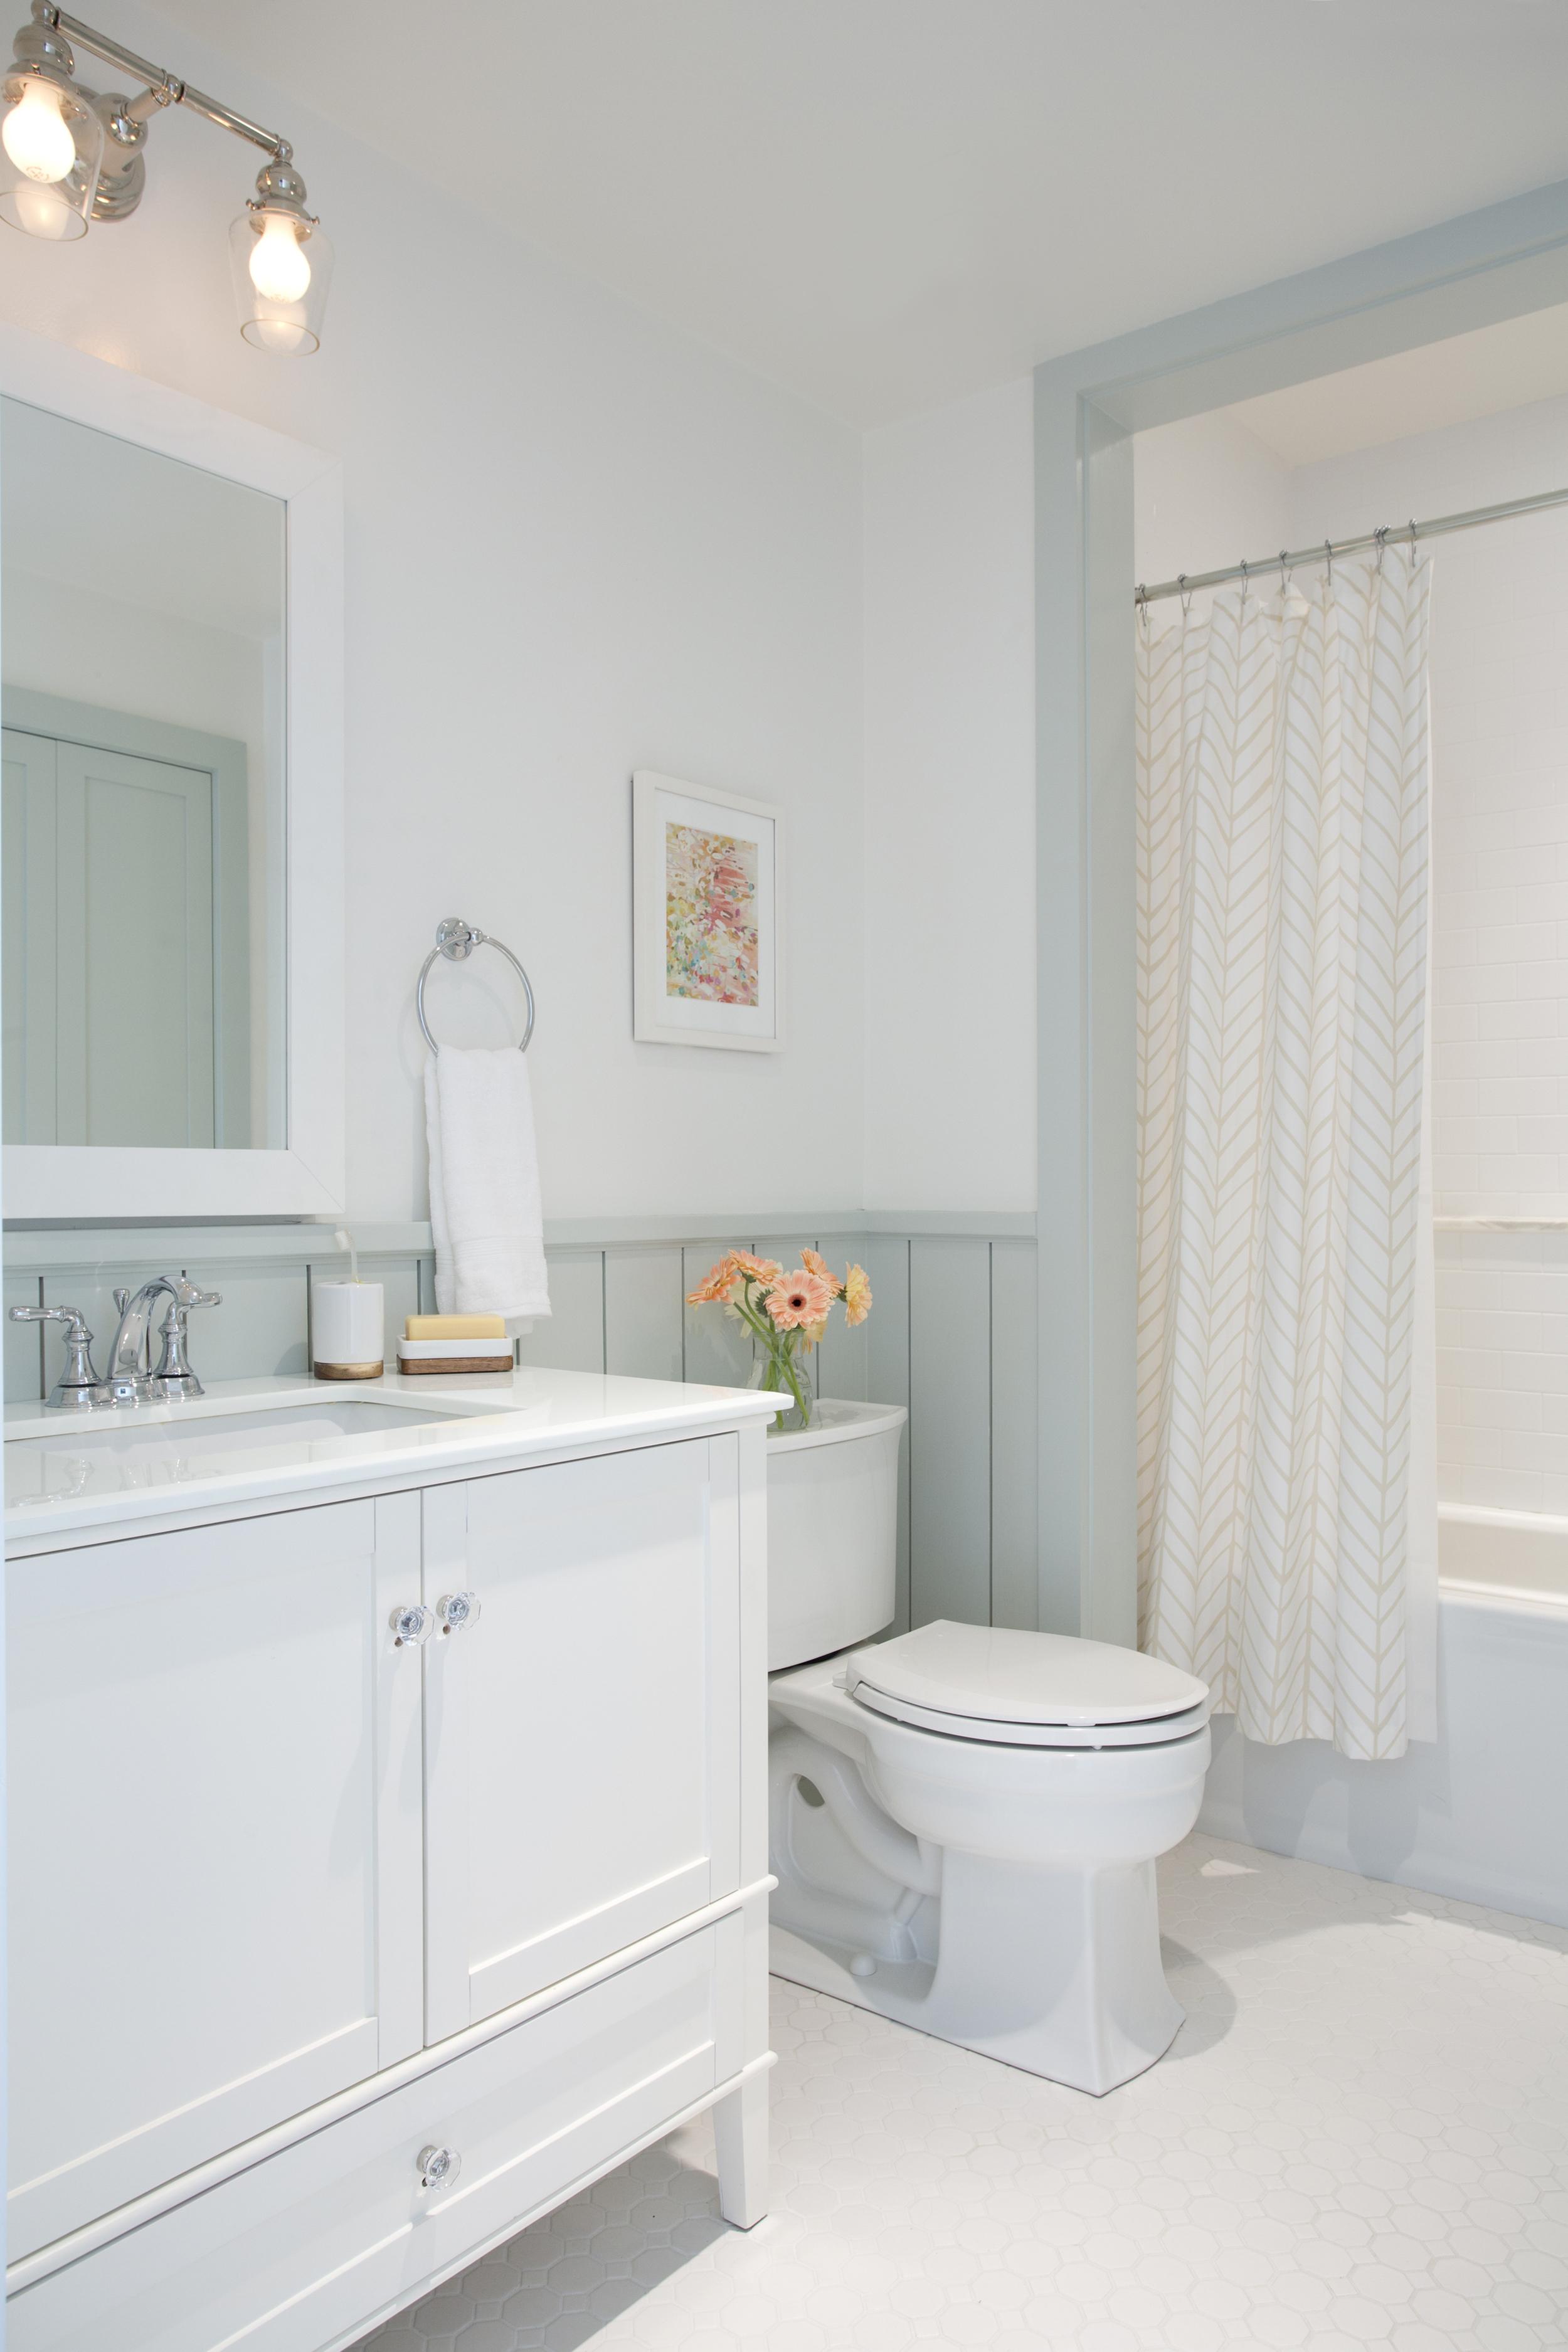 Braun + Adams Ross Bathroom Remodel.JPG